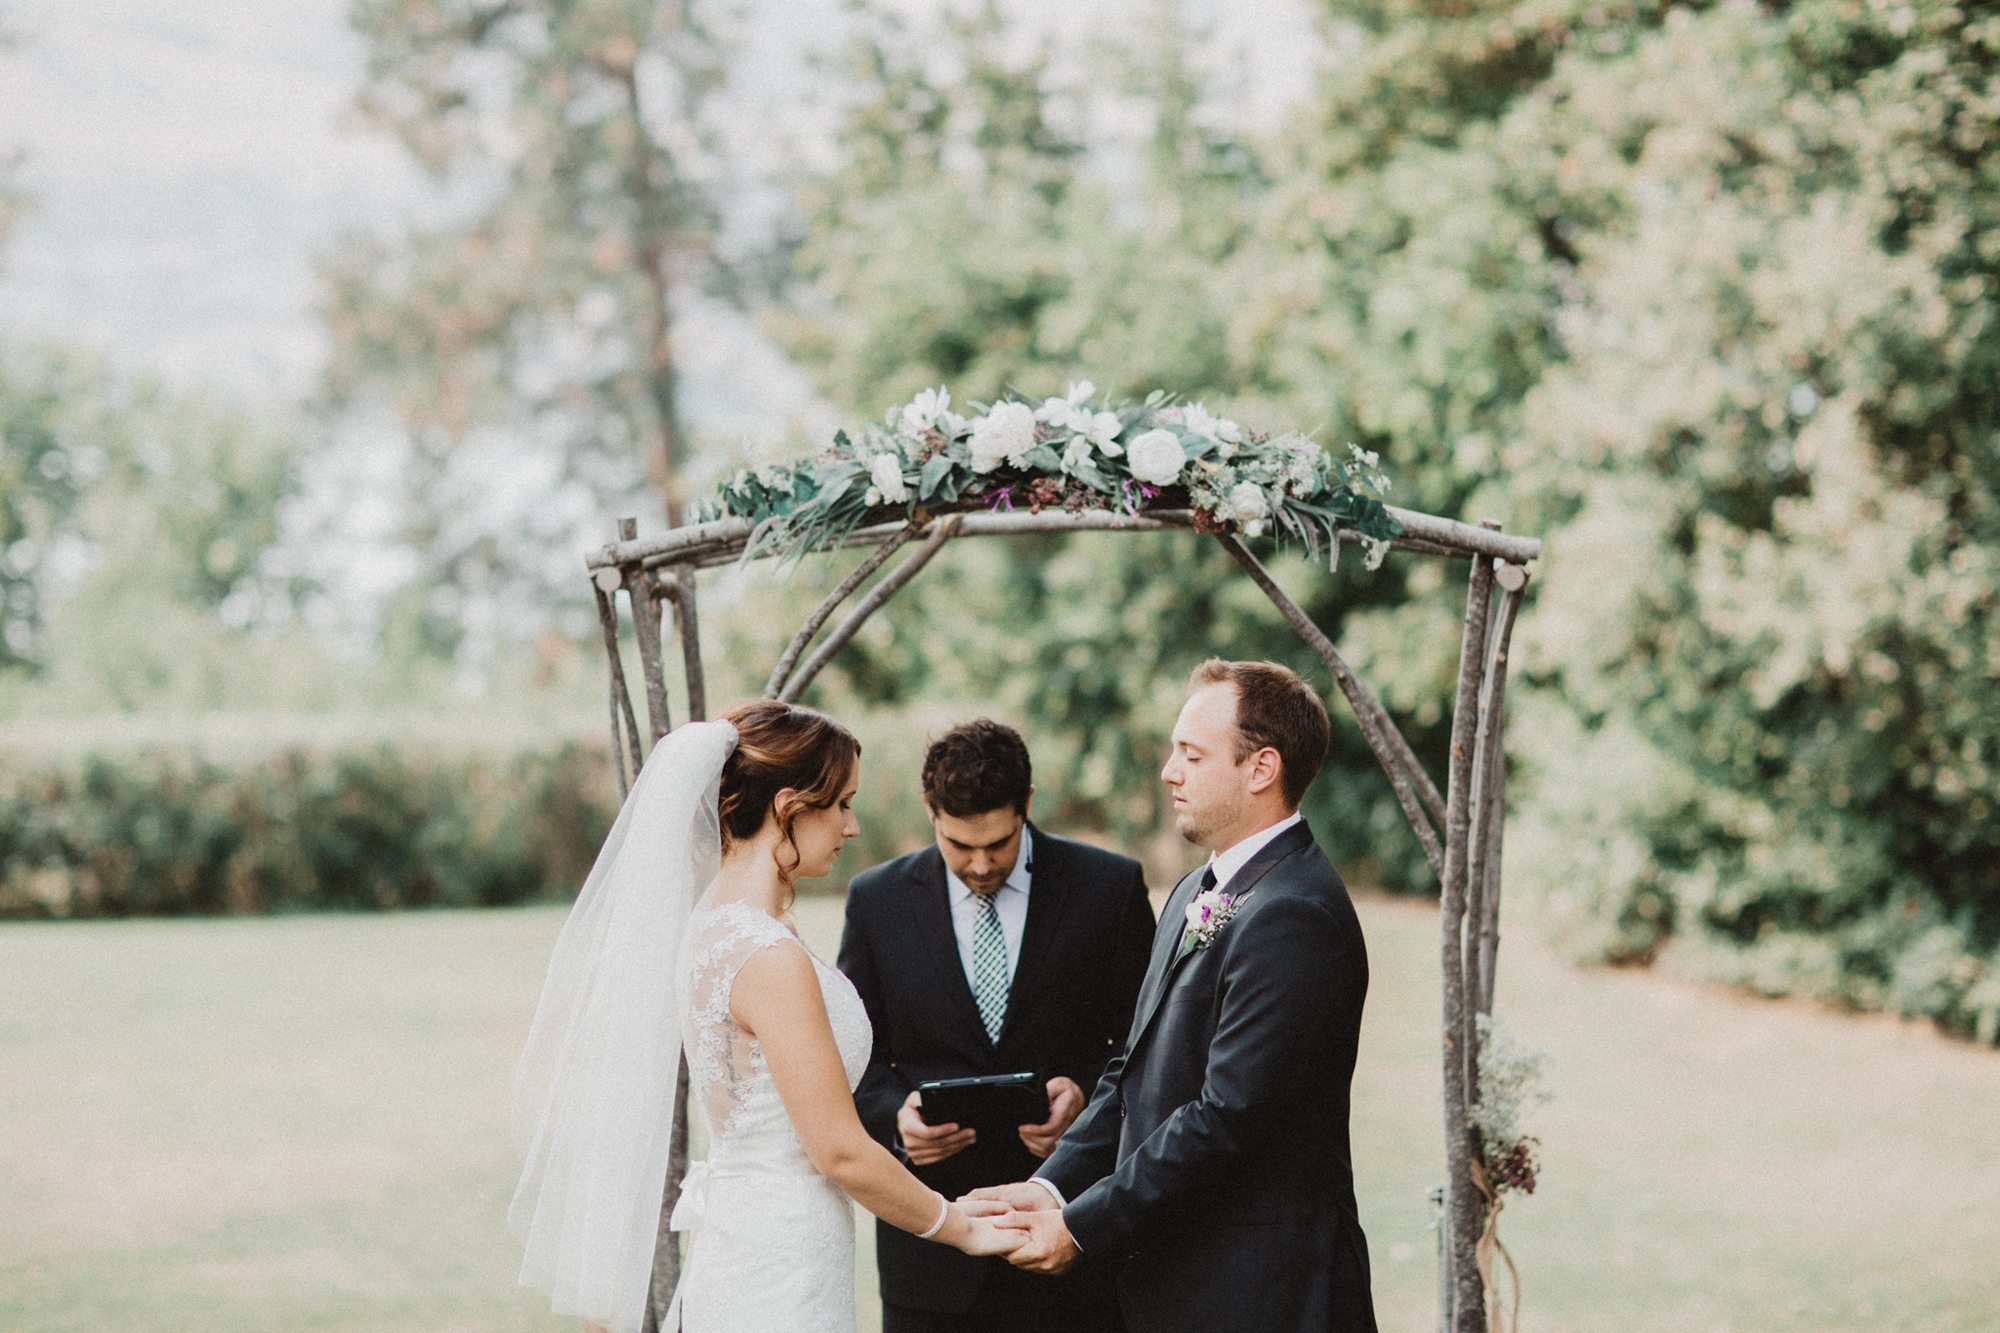 450-vernon-wedding-photographer